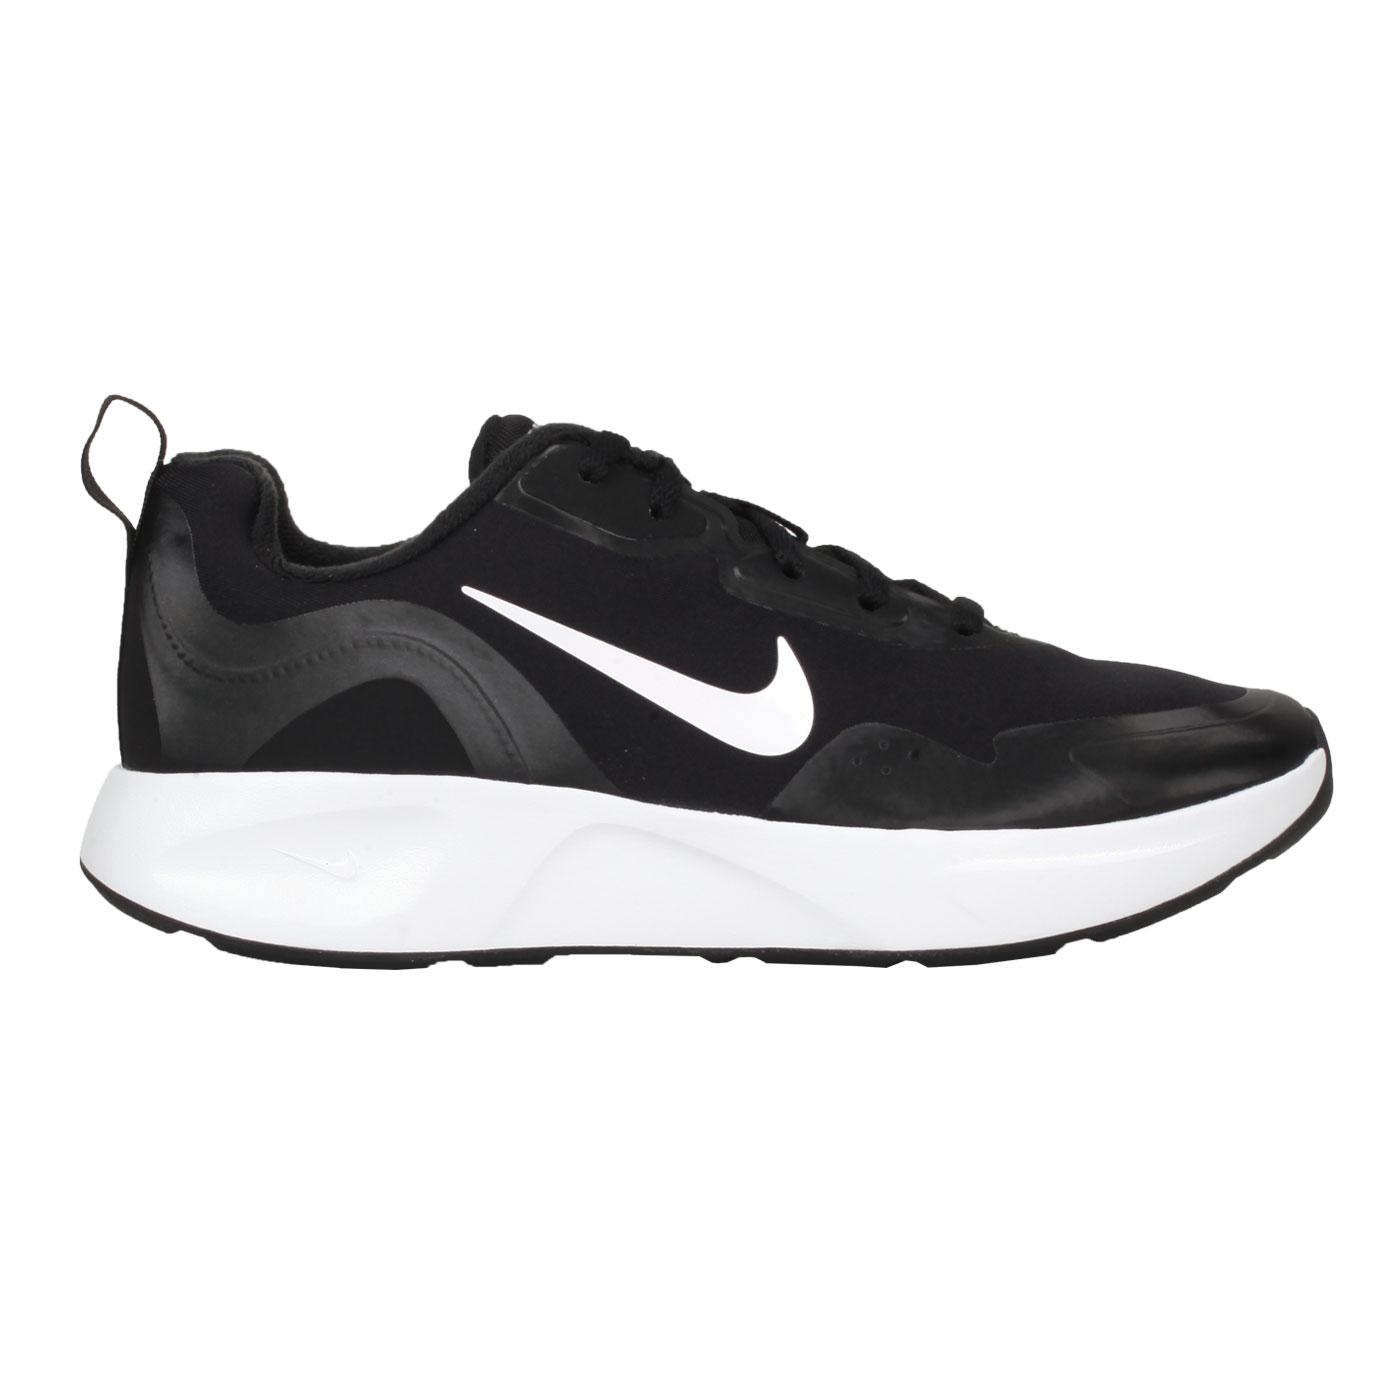 NIKE 女款慢跑鞋  @WEARALLDAY WNTR@CT1731002 - 黑白